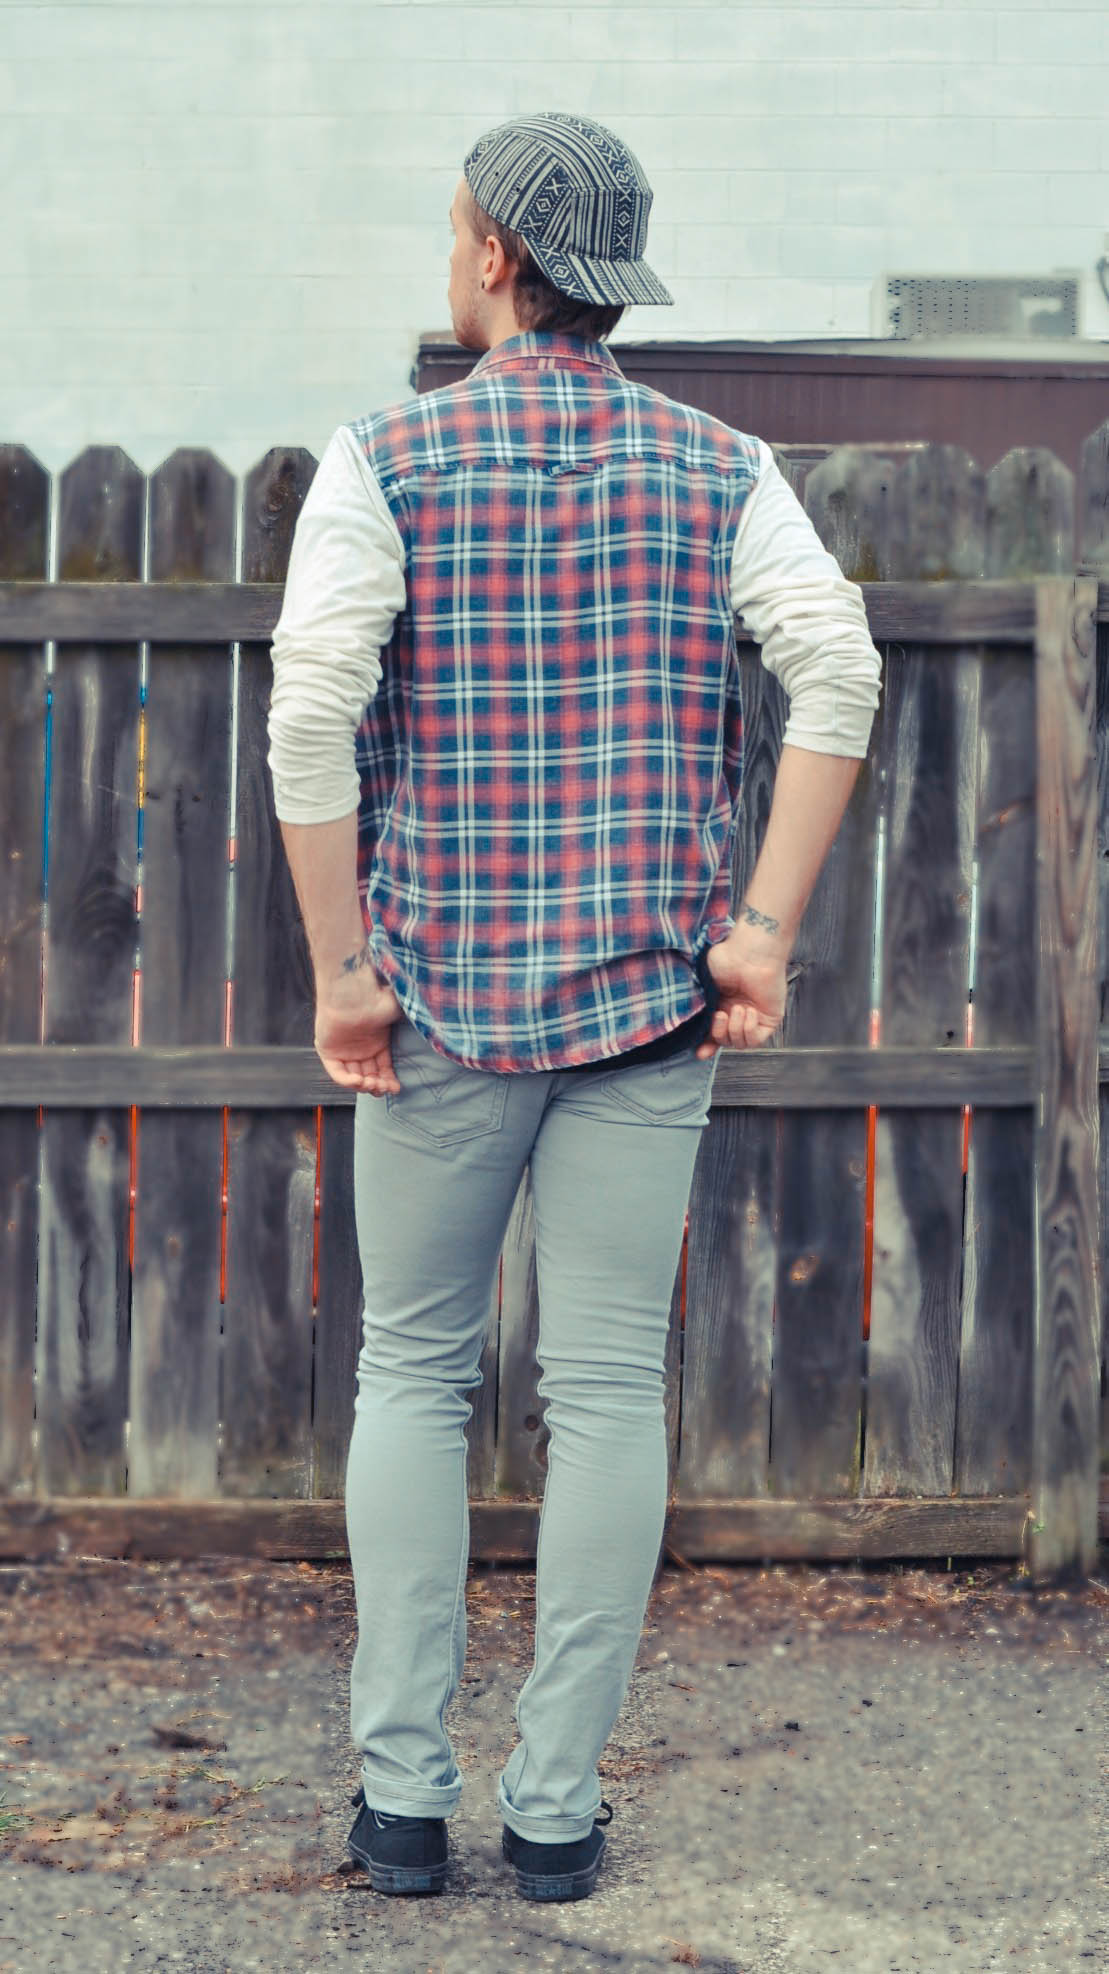 aztec-print-hat-forever-21-american-apparel-v-neck-t-shirt-color-fast-plaid-shirt-levis-jeans-chucks-converse